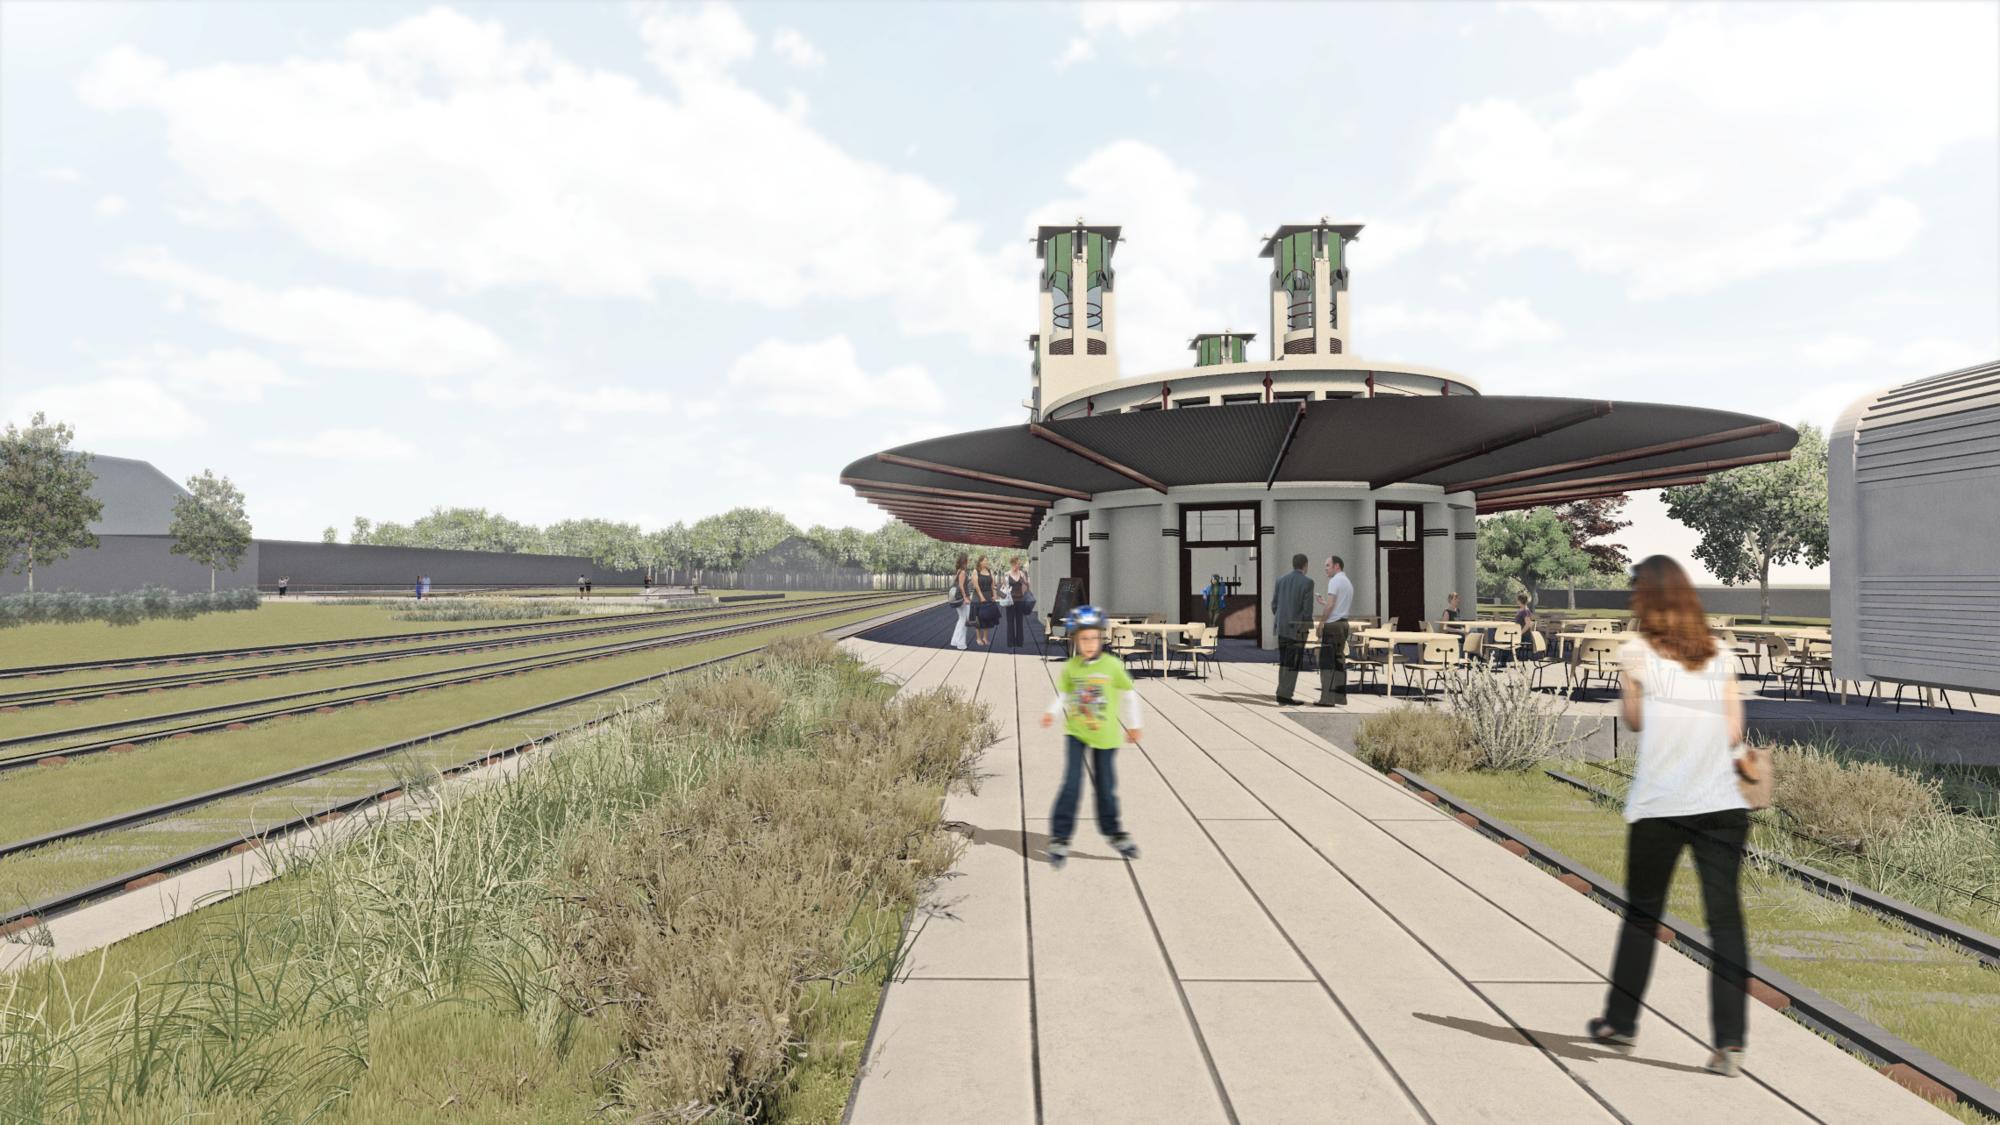 Primeiro Lugar no Concurso para o Restauro da Estação Ferroviária de Mairinque / SIAA + HASAA, © SIAA + HASAA